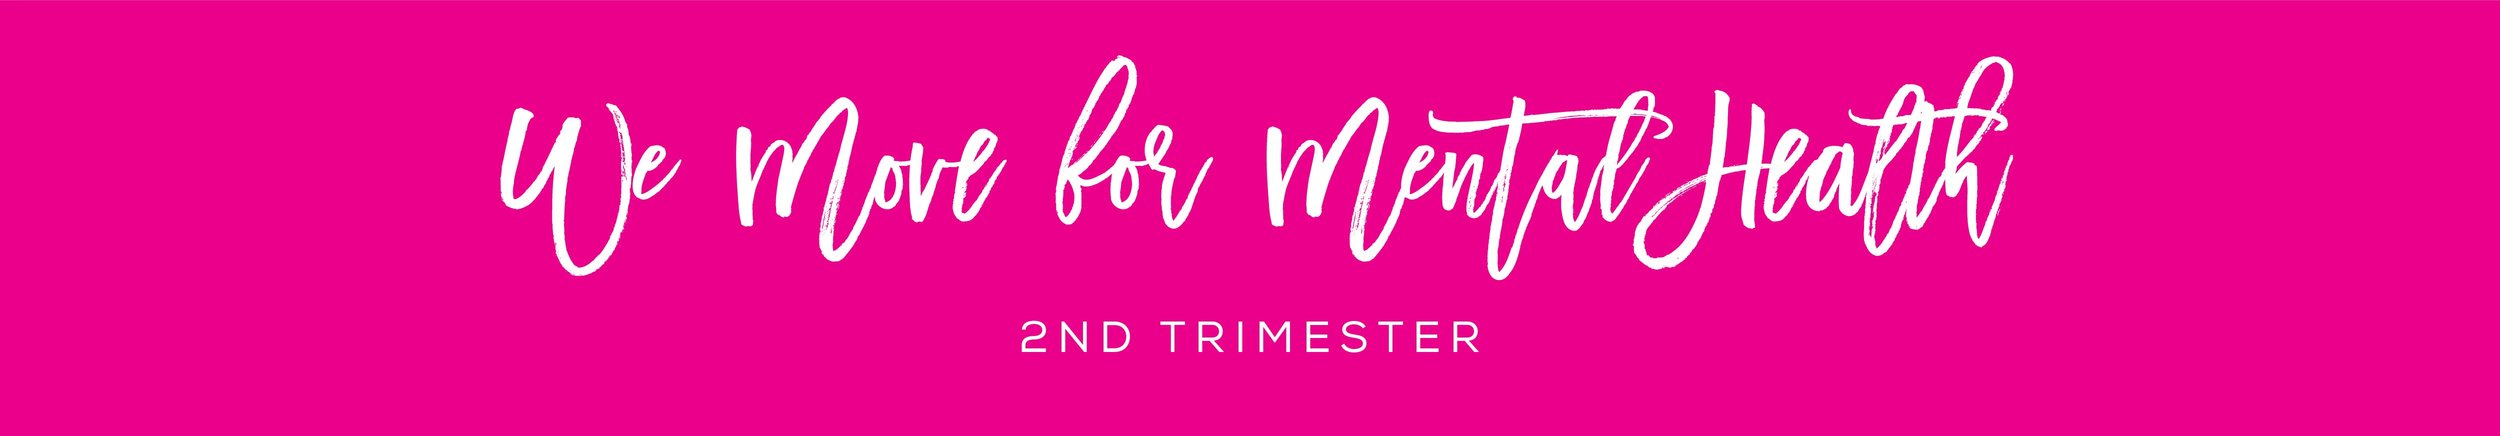 TMR_Web_ProgramHeader_WM4MH_2nd Tri_Pink-01.jpg